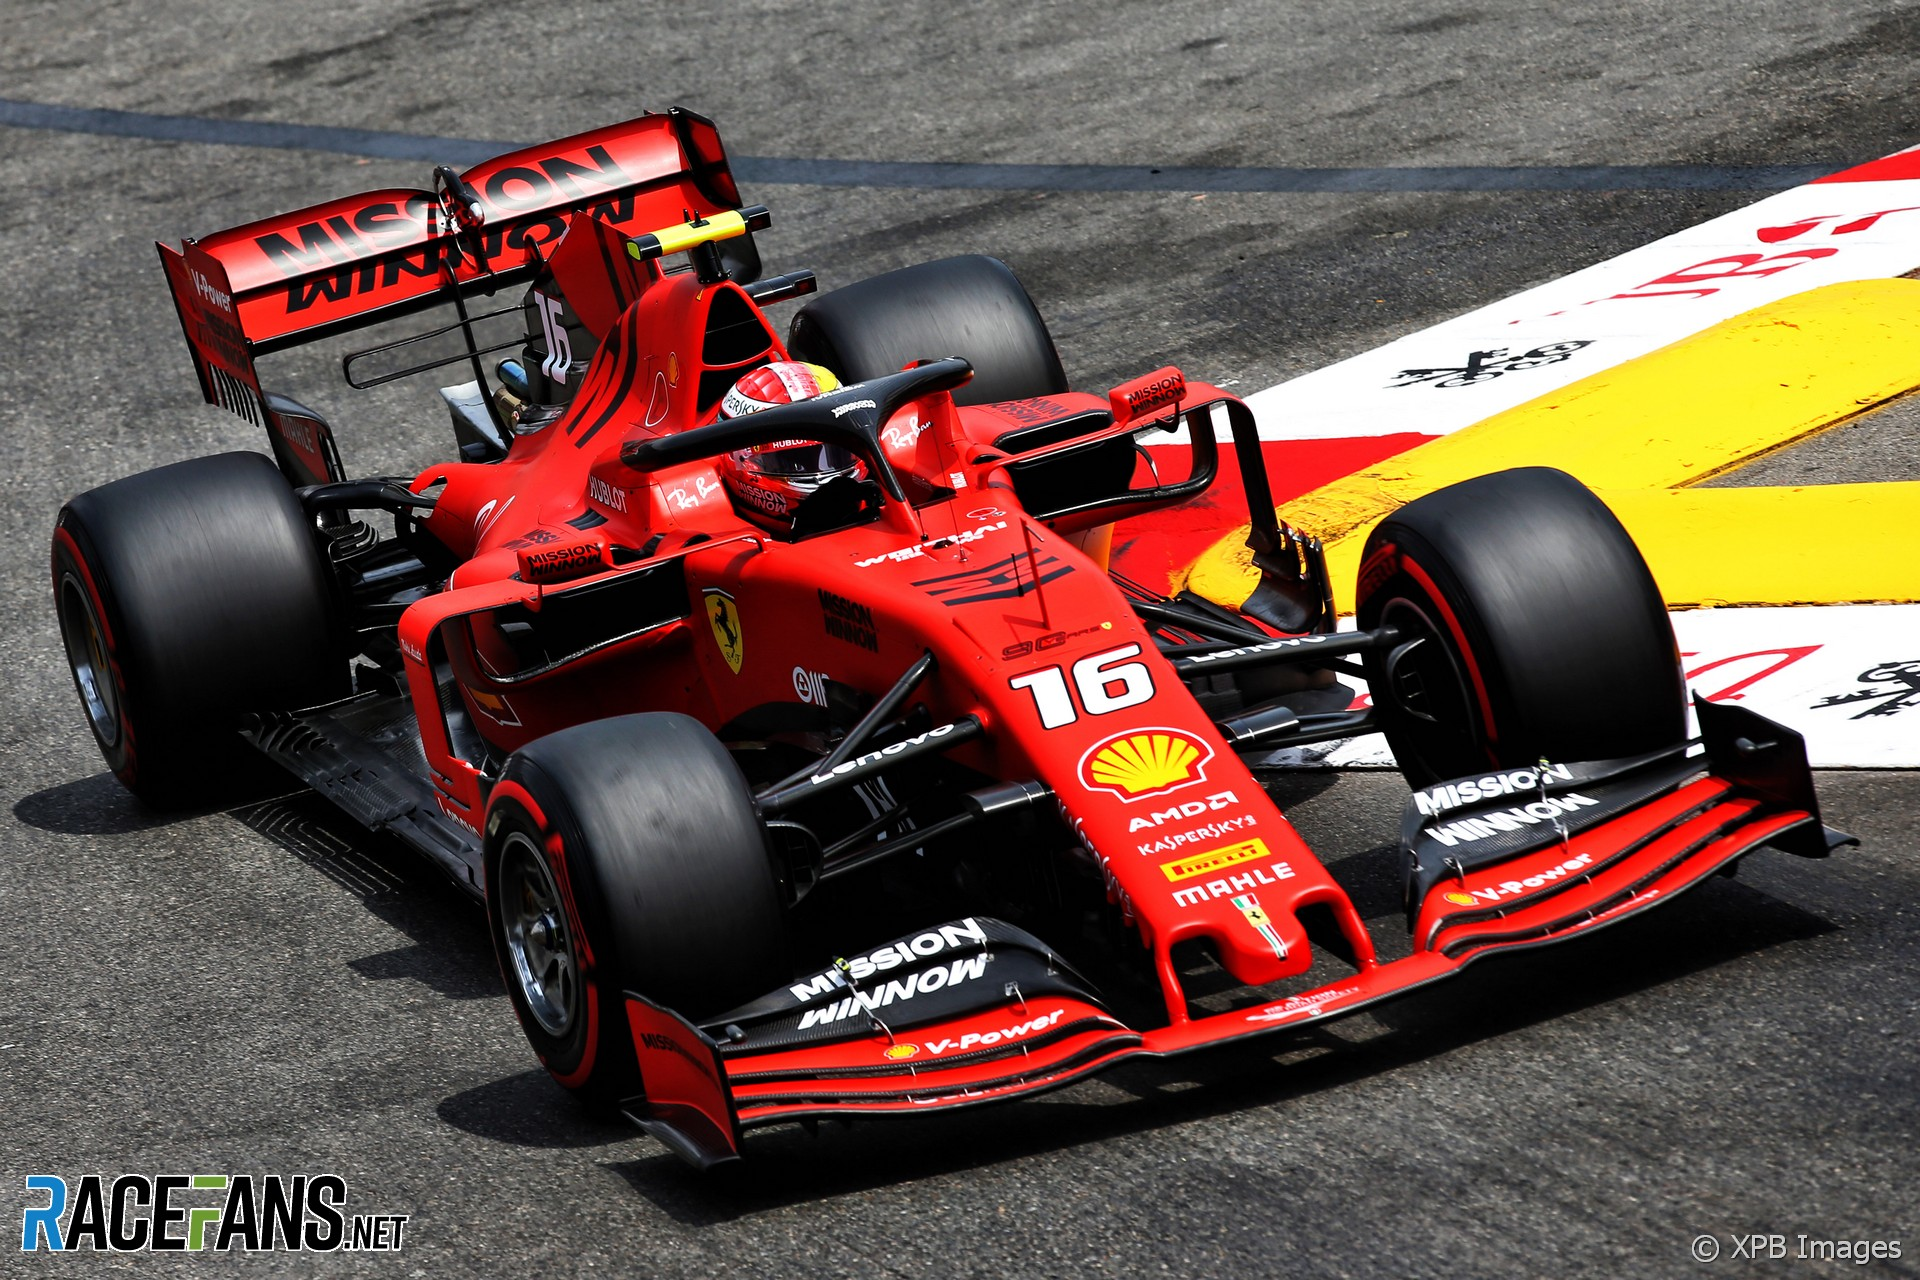 Charles Leclerc, Ferrari, Monaco, 2019